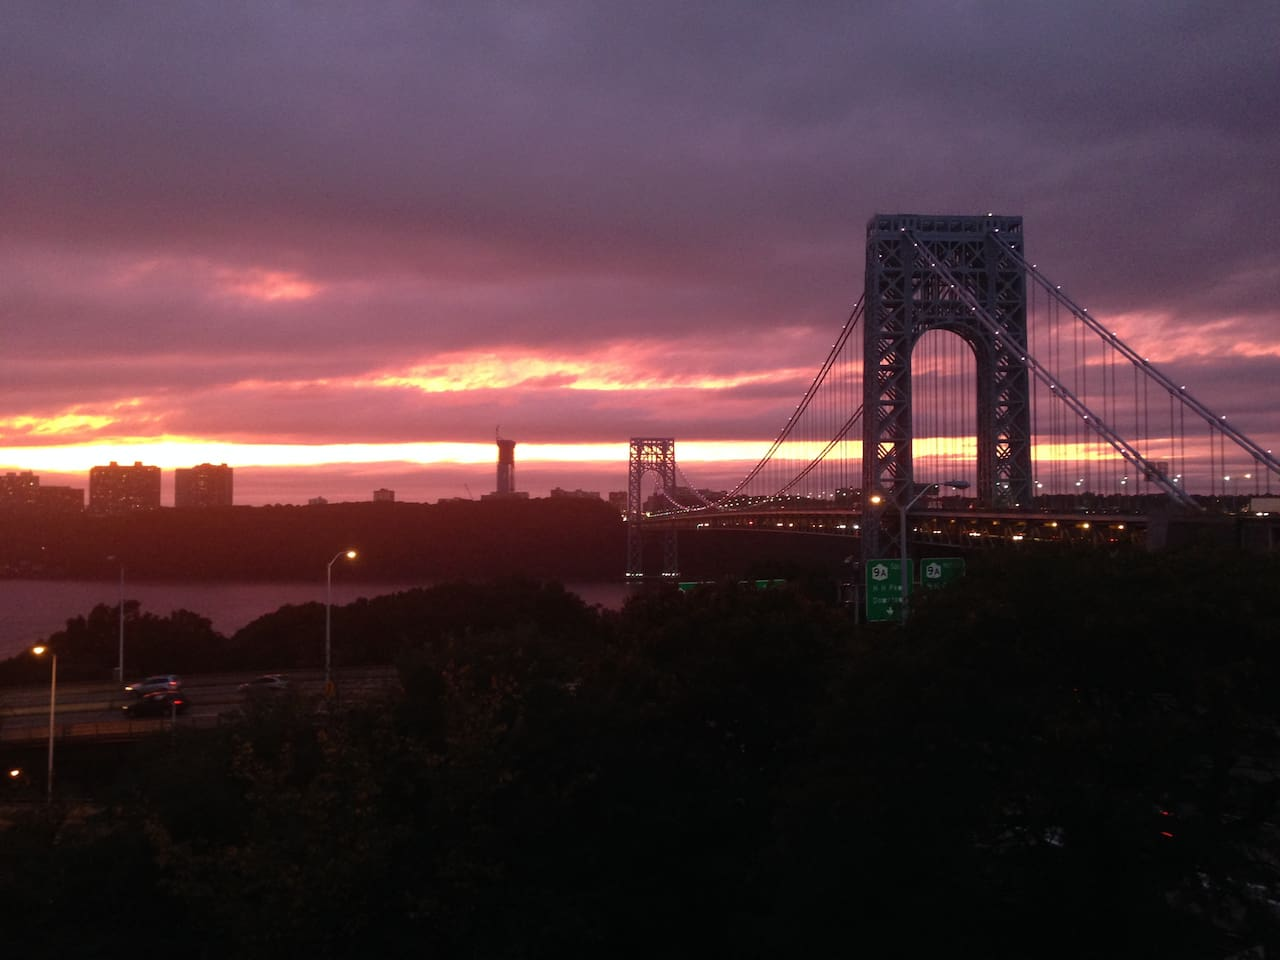 Sunset view of the Hudson River & George Washington Bridge